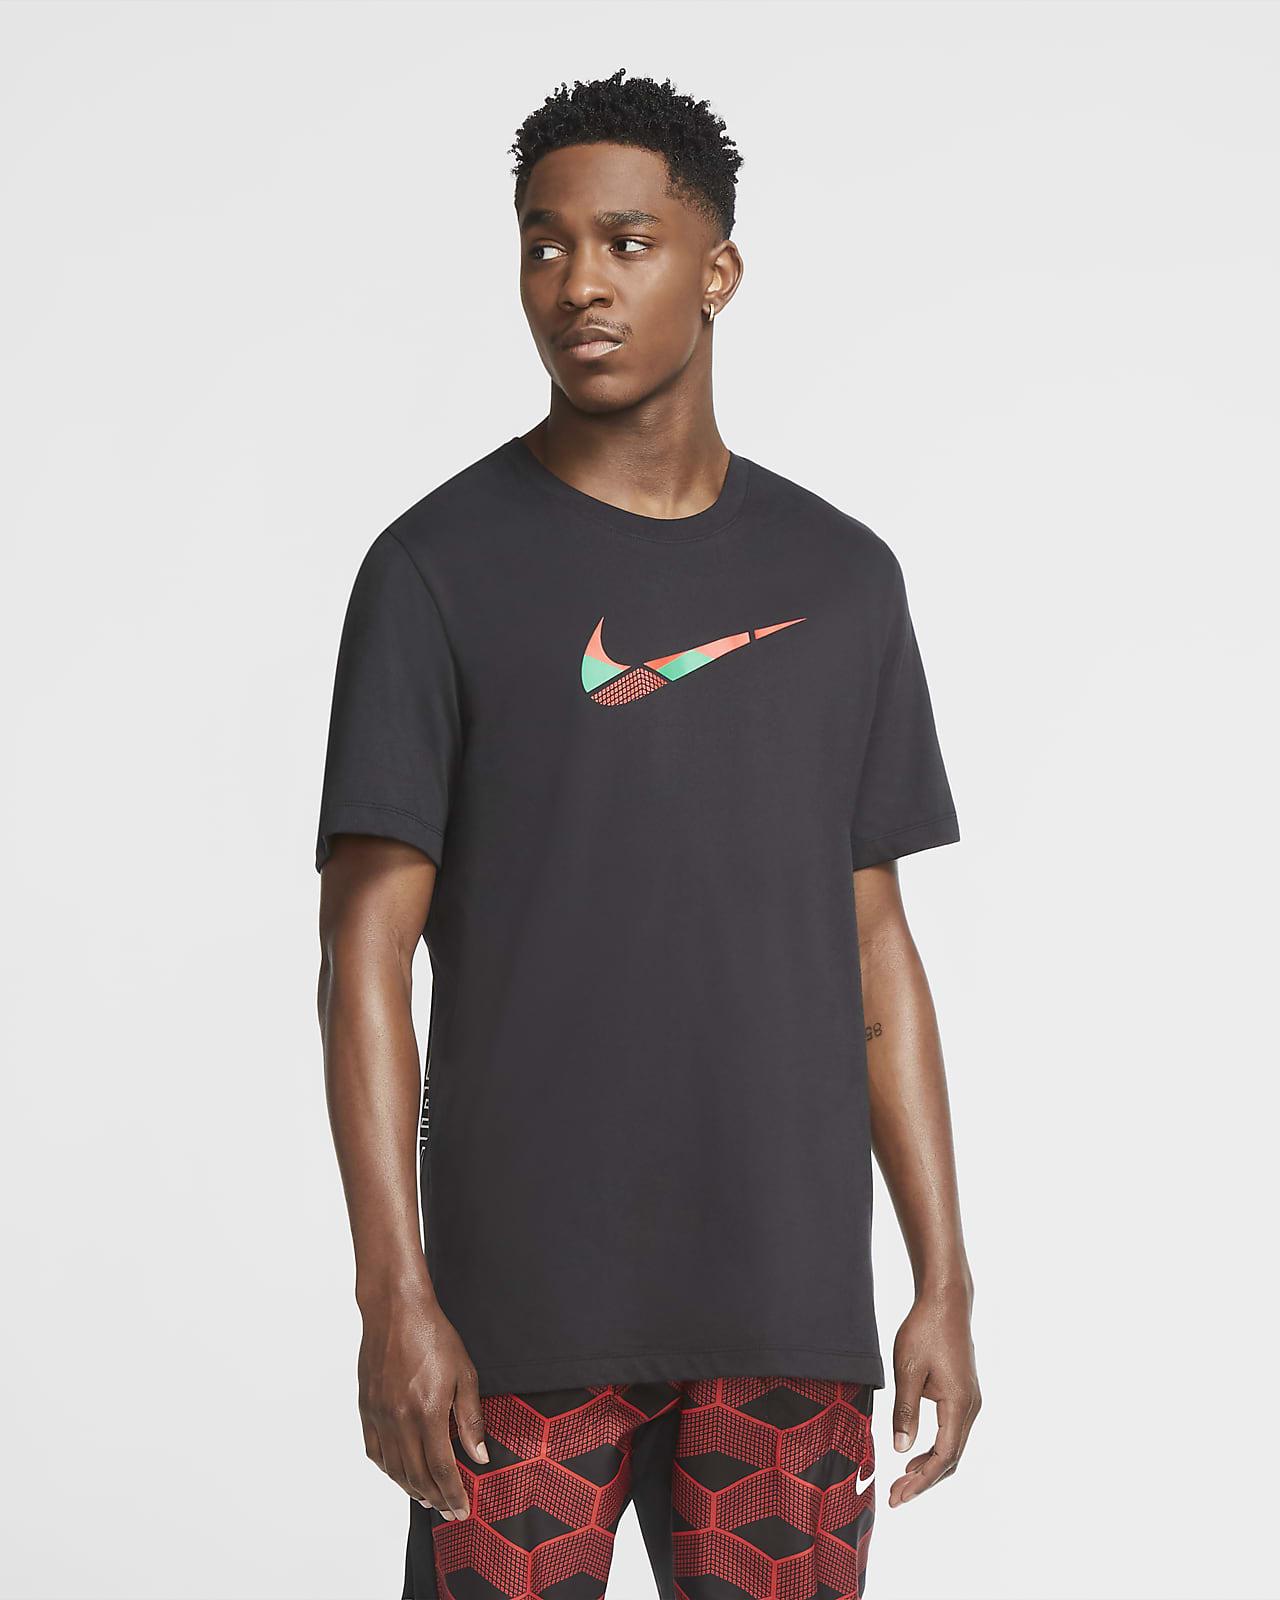 Nike Team Kenya Dri-FIT Running T-Shirt